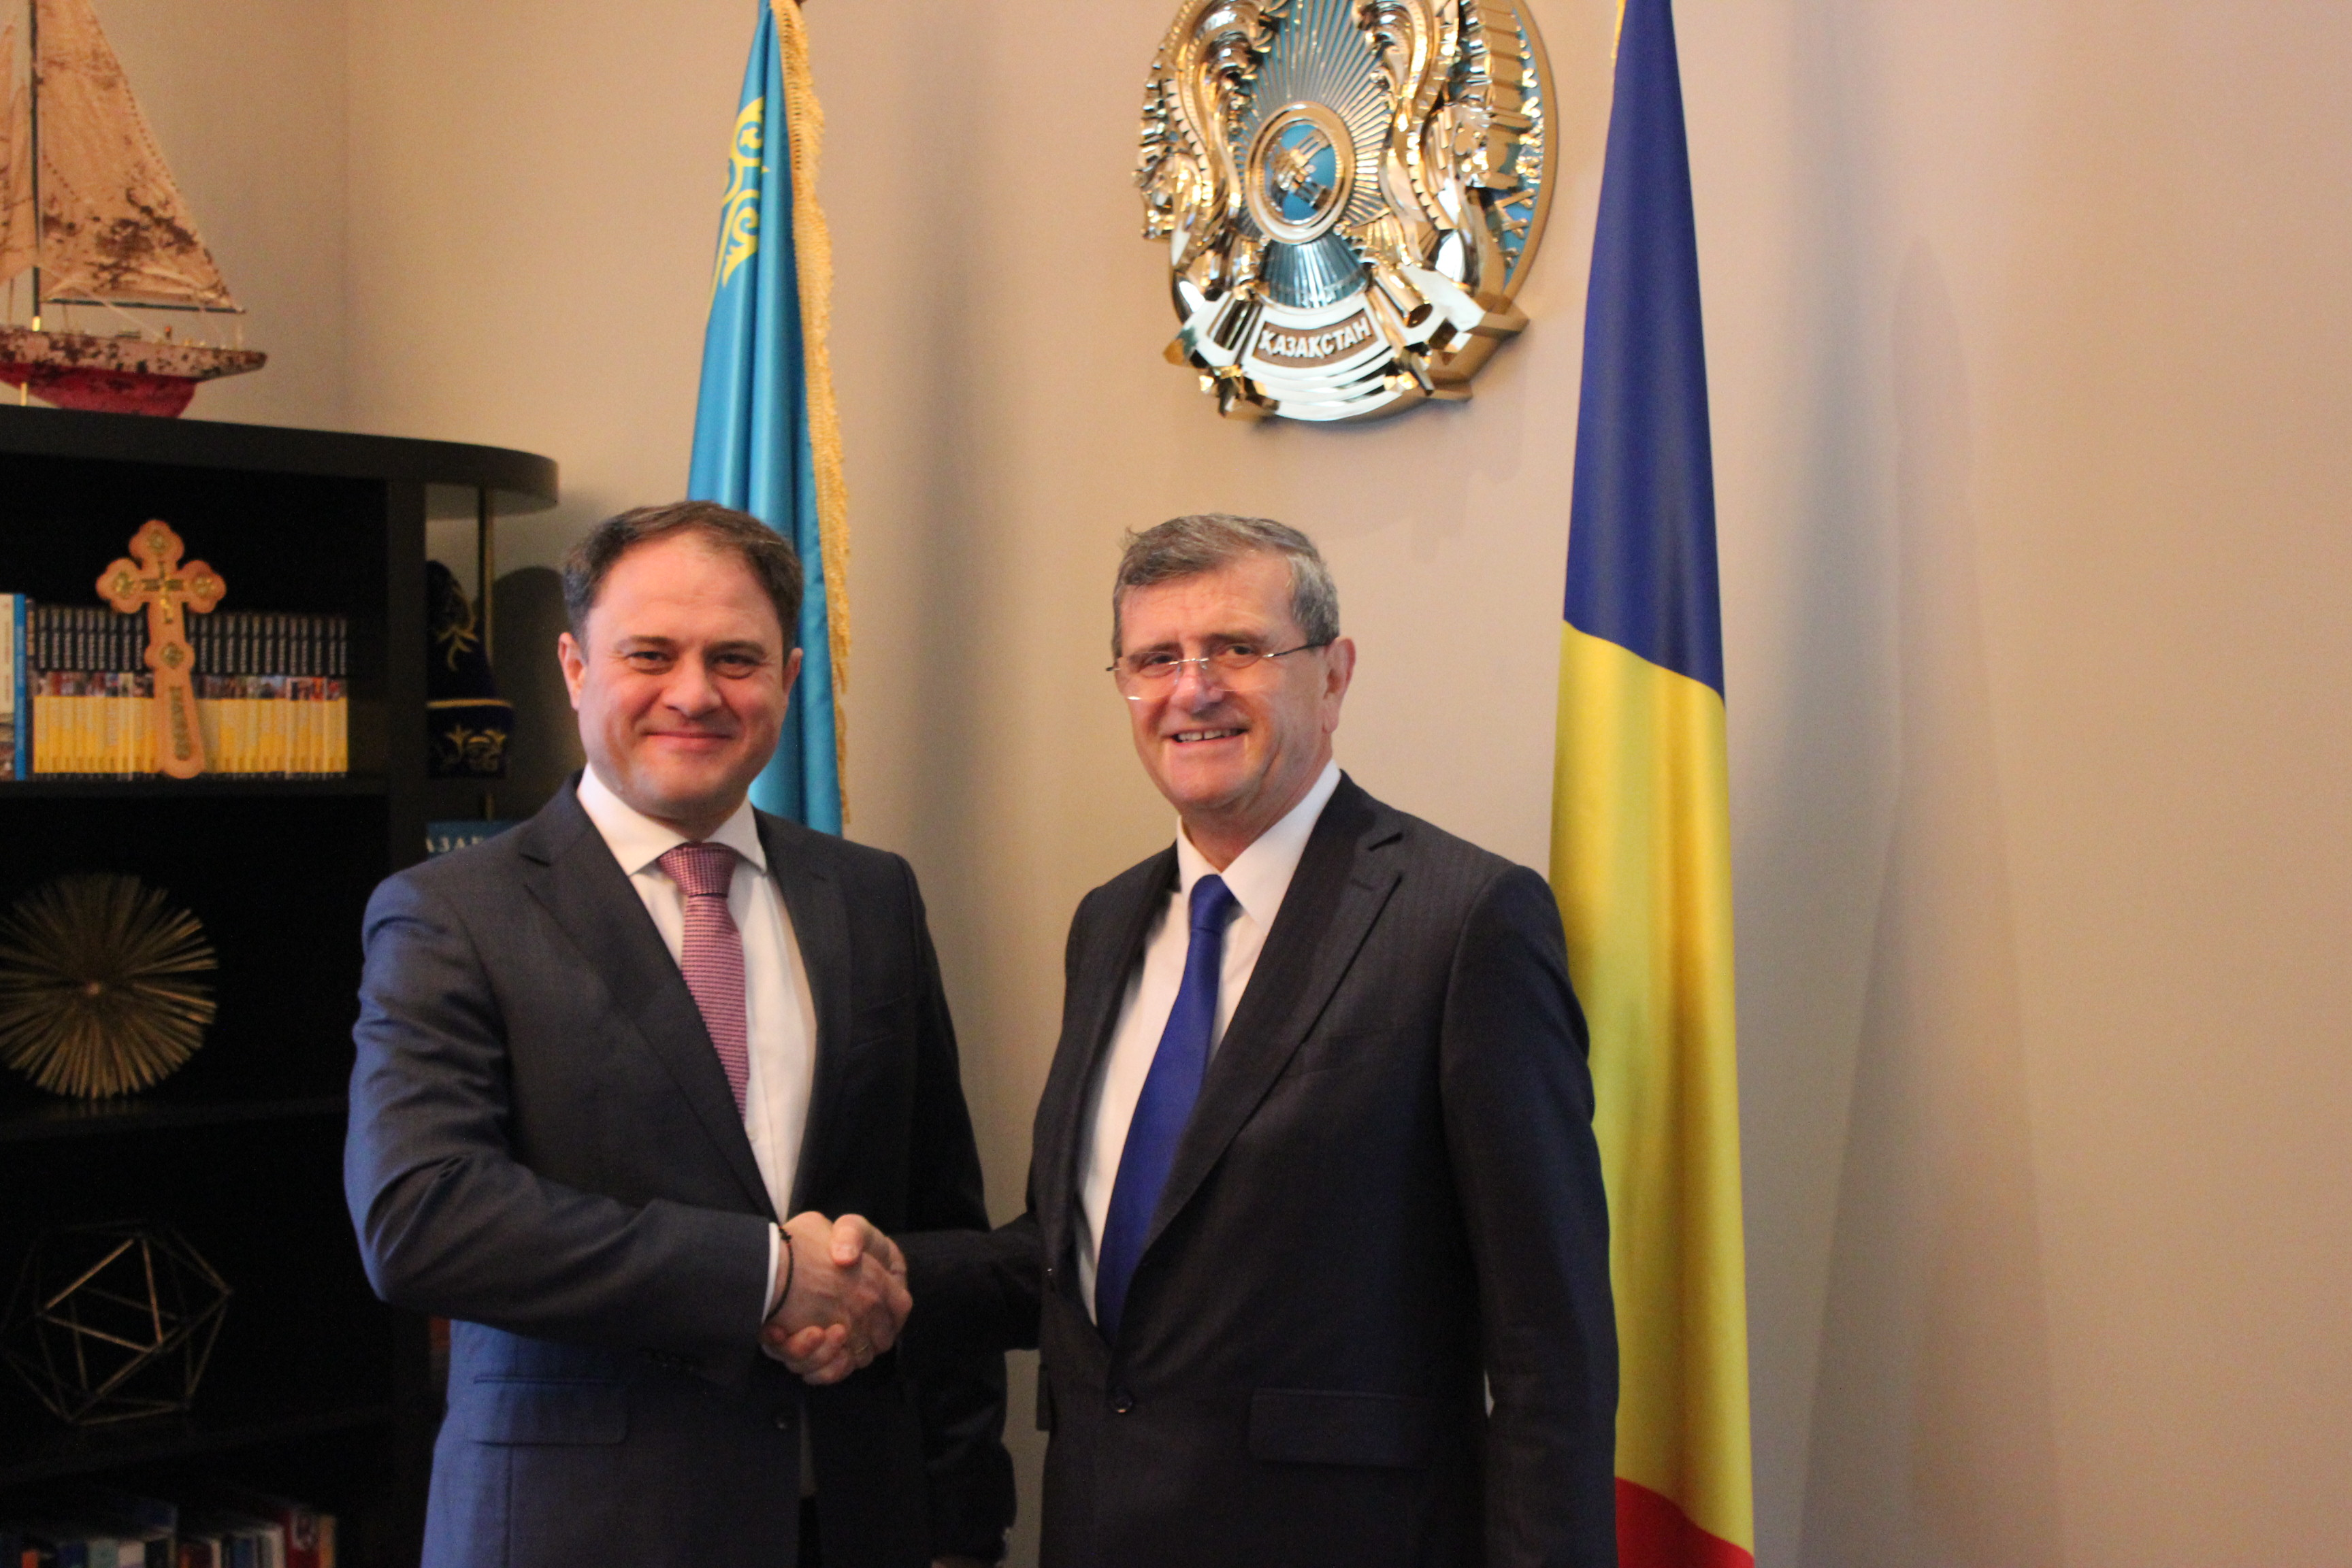 Казахстан и Румыния усилят сотрудничество в IT-сфере и агроиндустрии